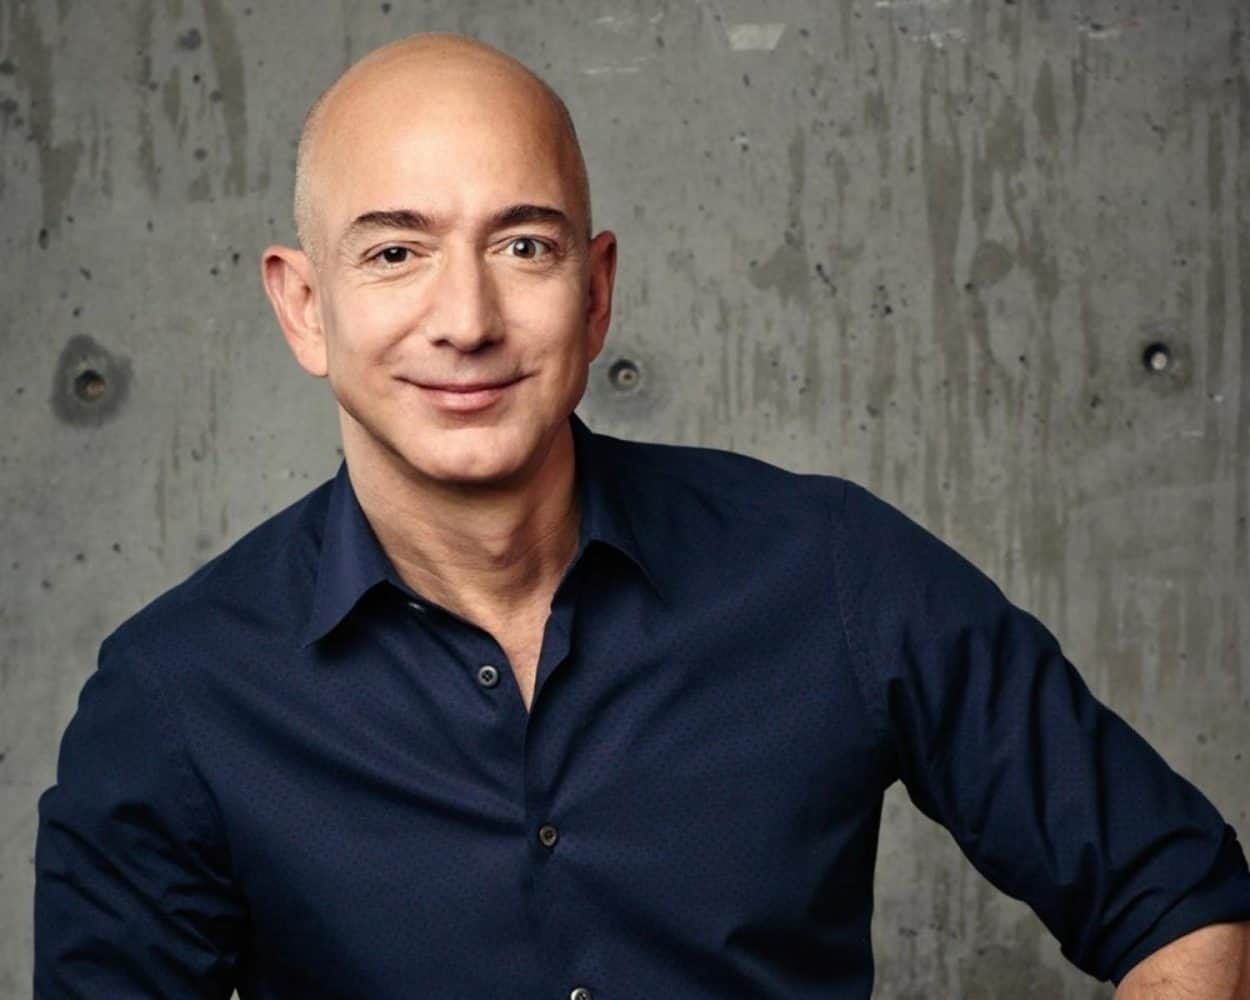 How Jeff Bezos' Makes High-Velocity Decisions